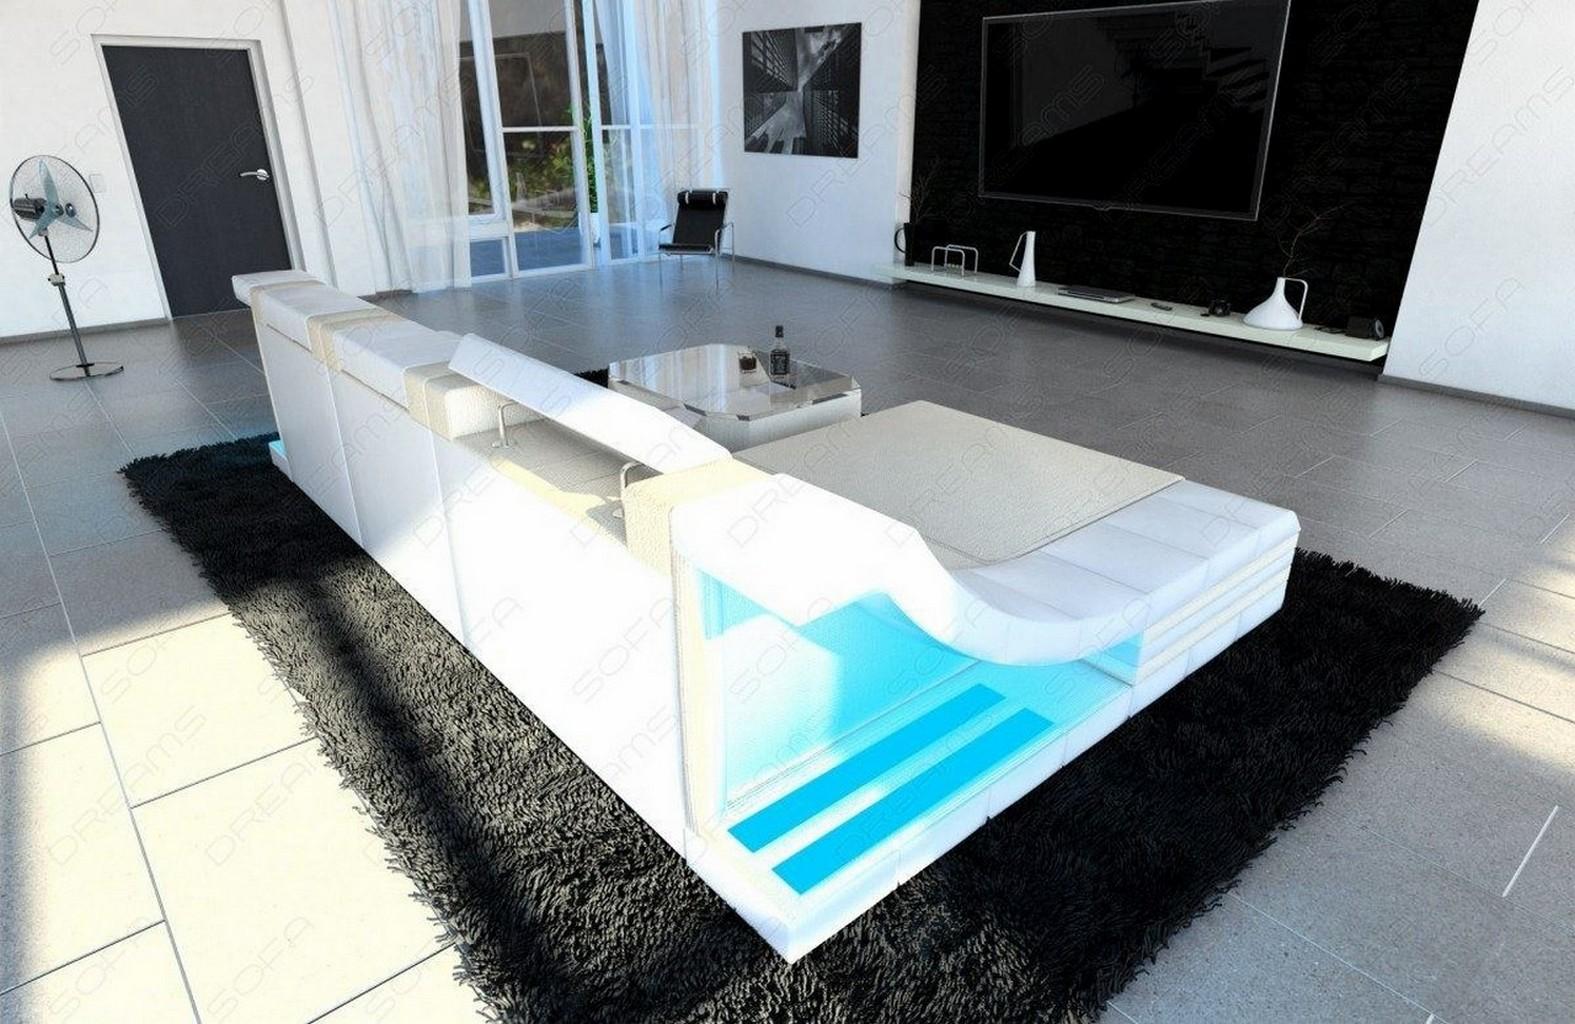 elegantes ecksofa mit led beleuchtung fotos erindzain. Black Bedroom Furniture Sets. Home Design Ideas